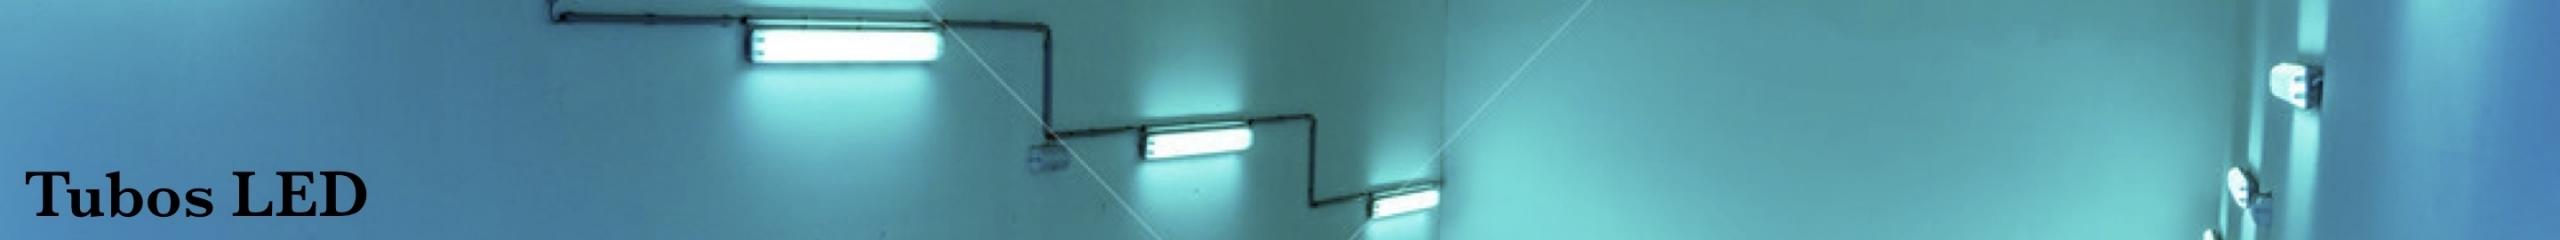 Tubos LED T8 Cristal